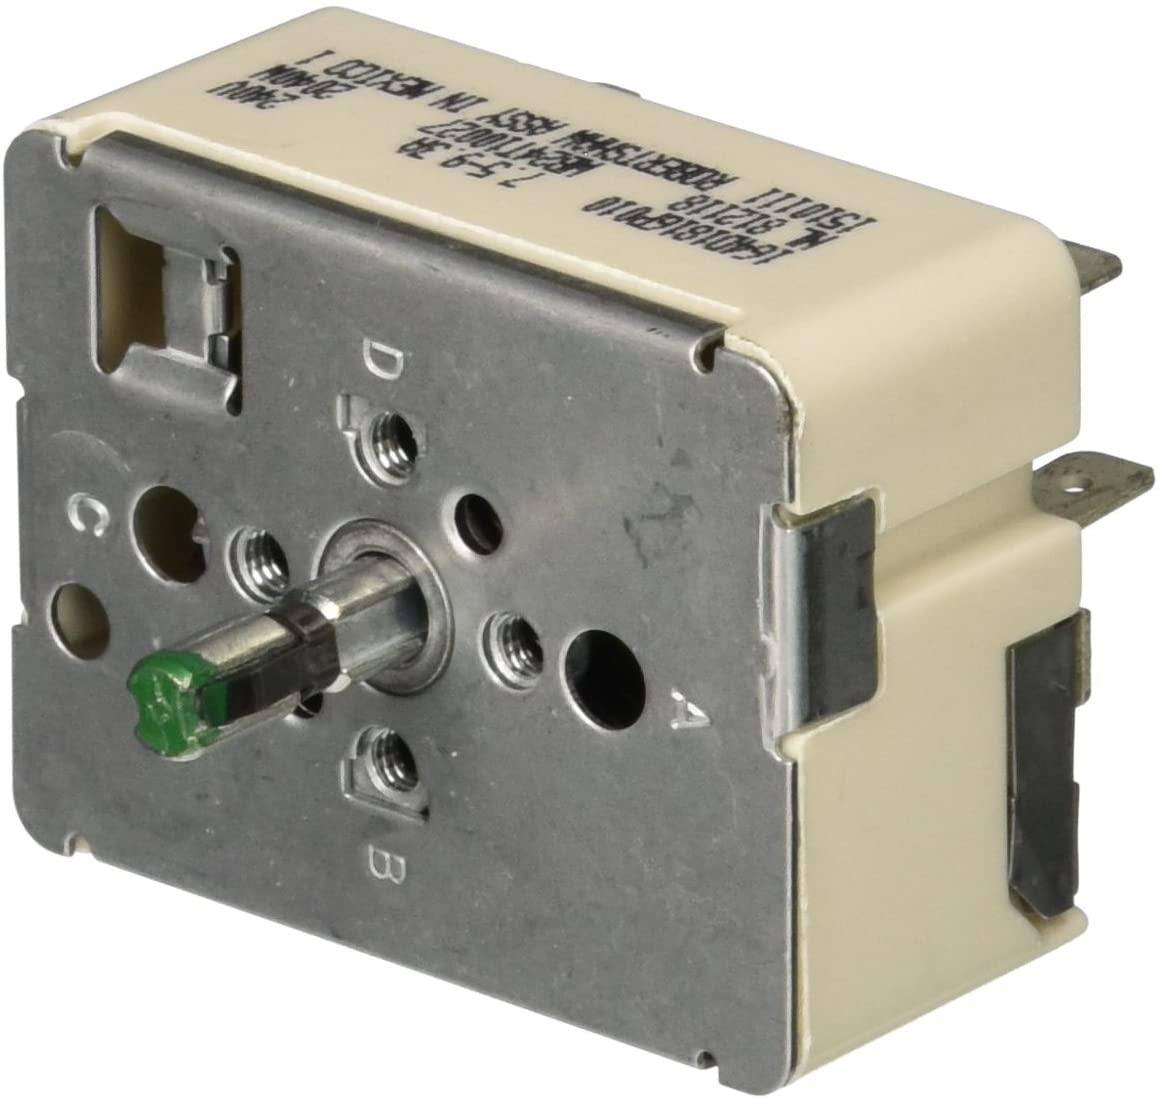 WB24T10027 GE Oven Burner Infinite Switch